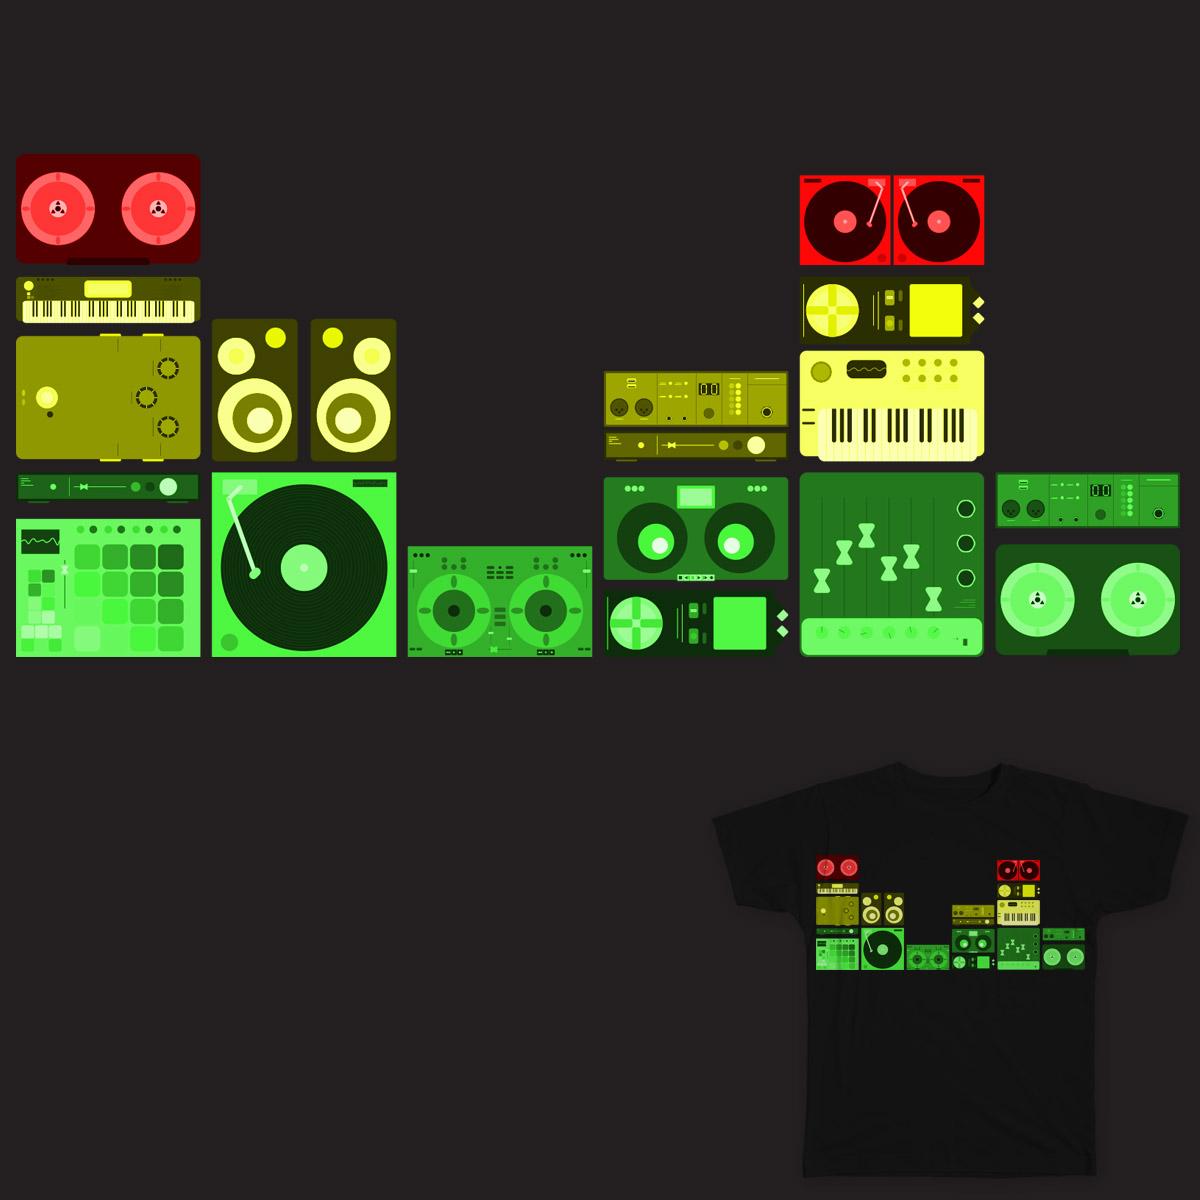 Technical Spectrum by AlmsT17 on Threadless